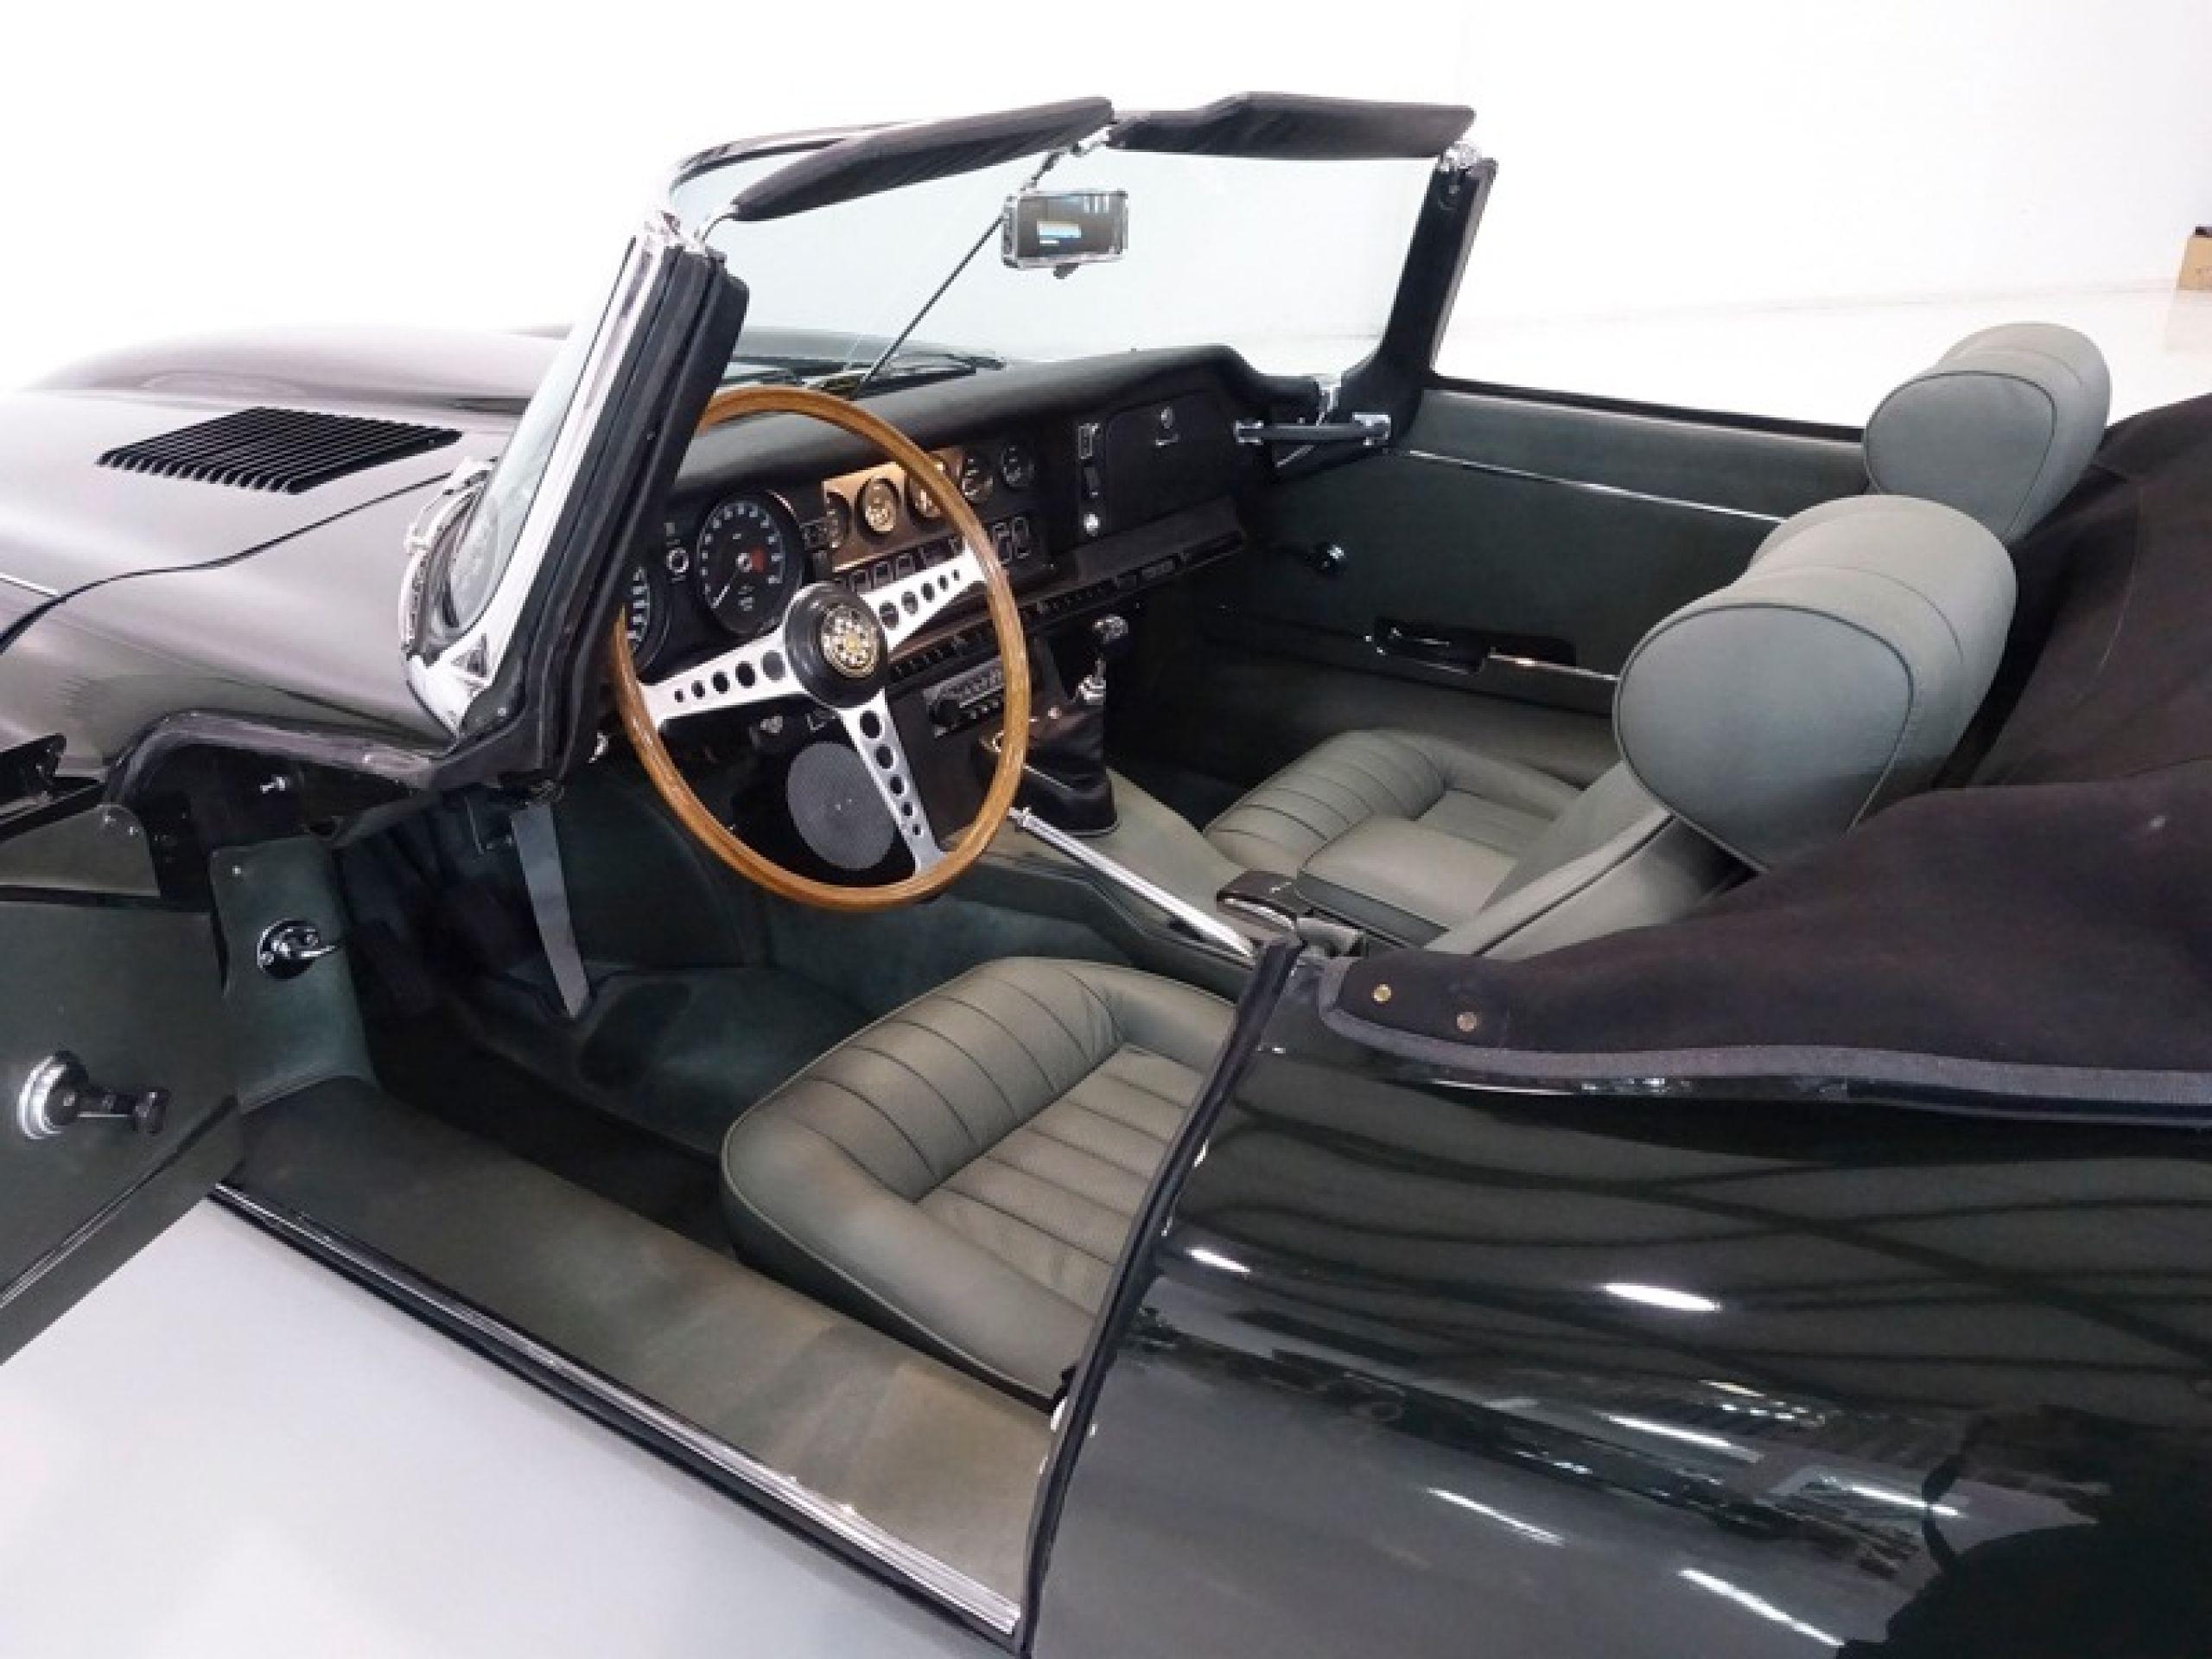 1969 Jaguar E-Type Series II Roadster